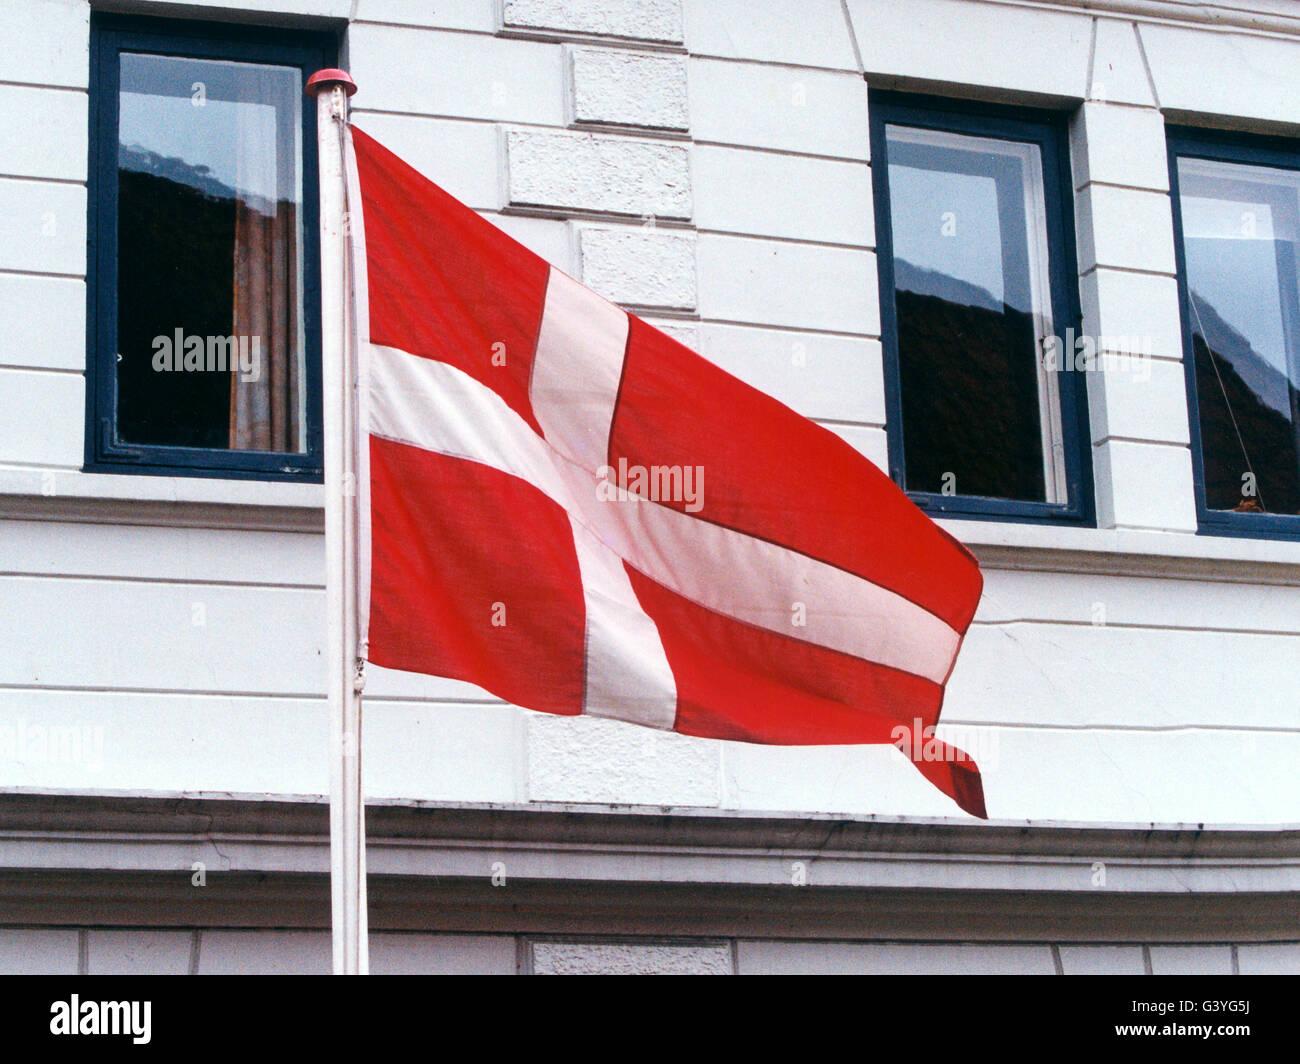 The Danish flag - Stock Image